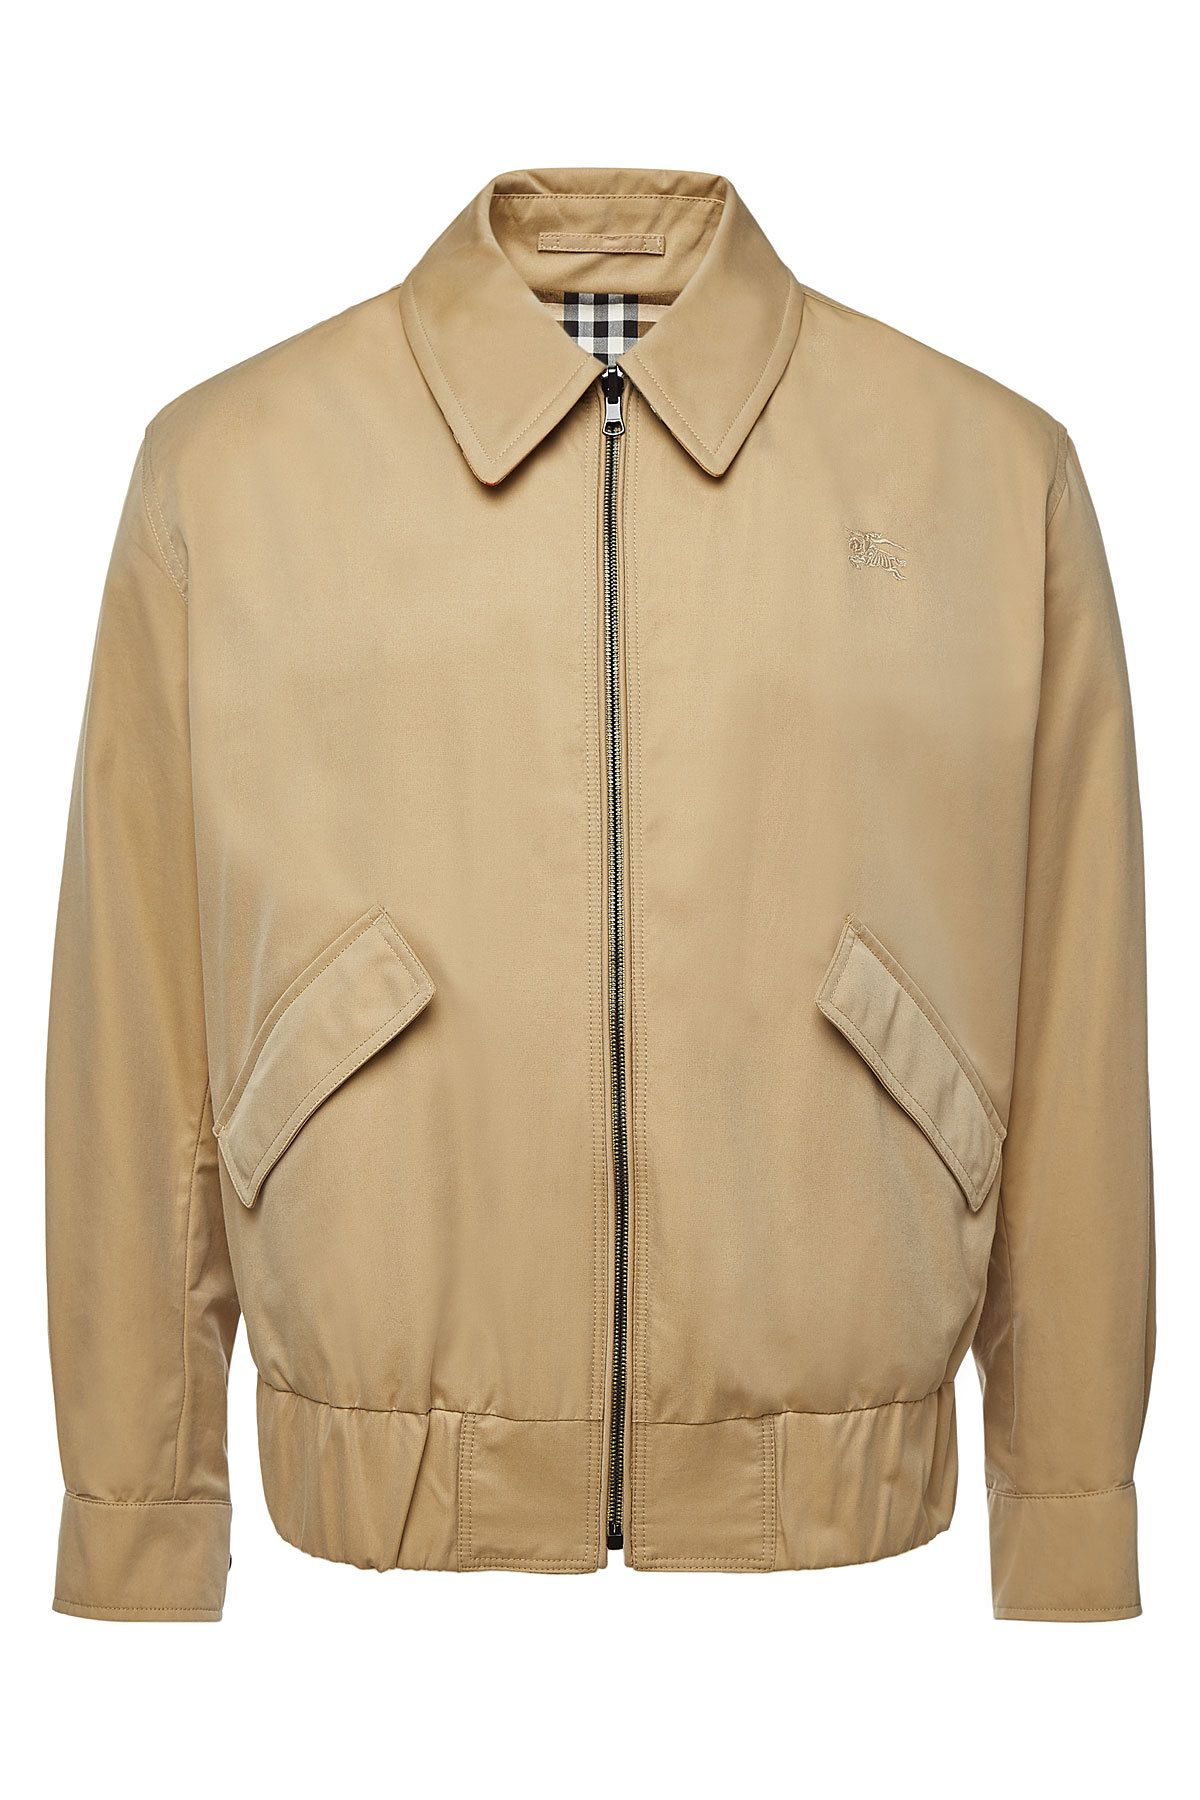 Burberry Stratford Reversible Cotton Bomber Jacket In Beige Modesens Bomber Jacket Jackets Mens Bomber [ 1800 x 1200 Pixel ]